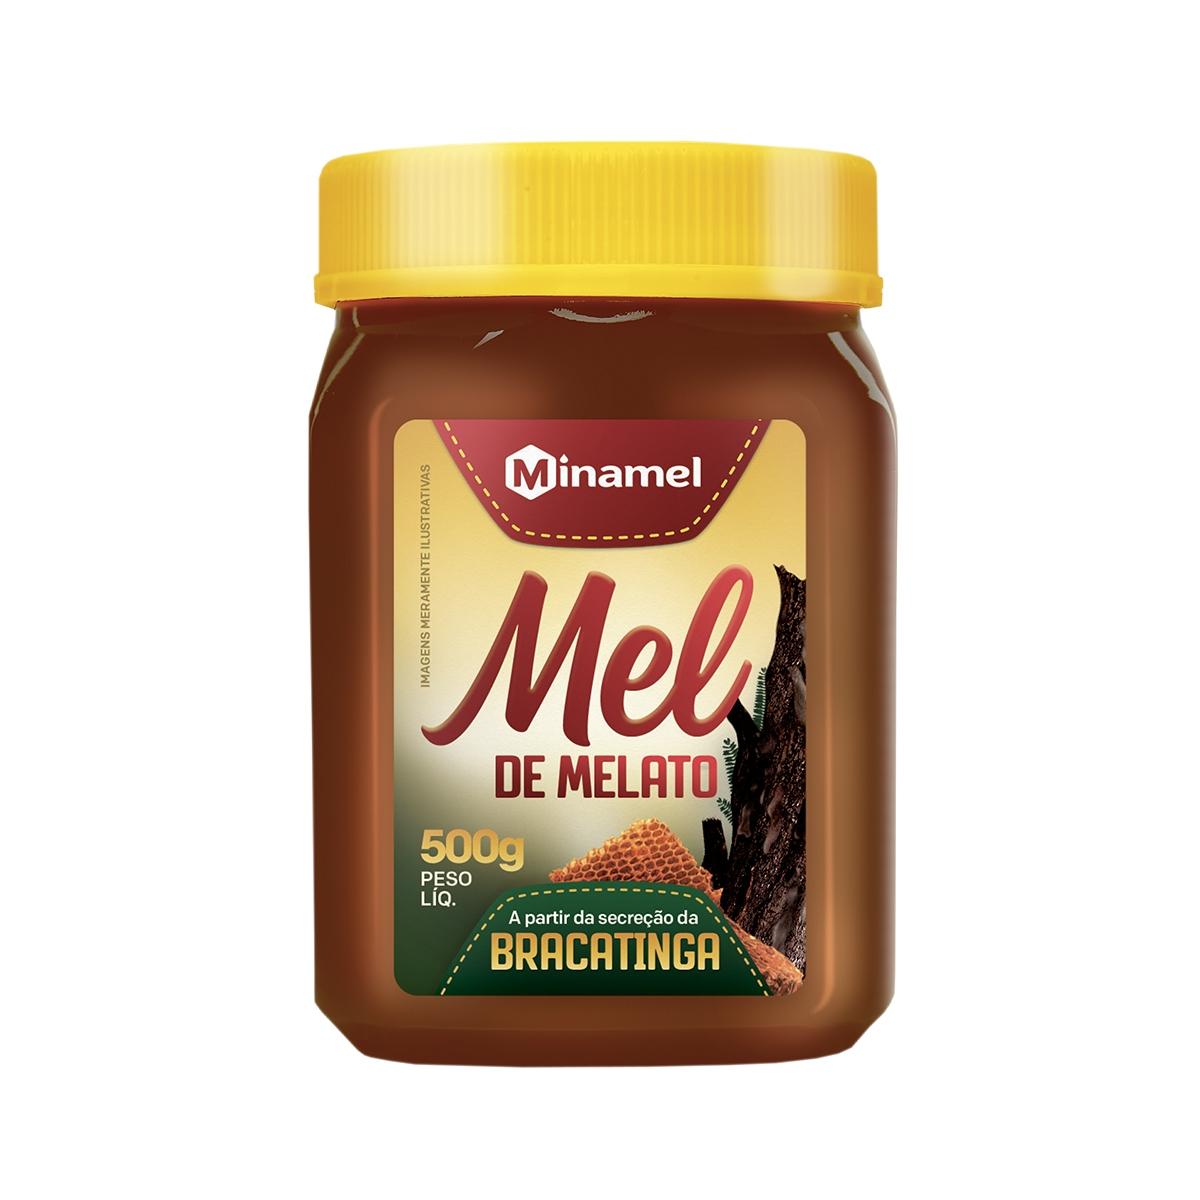 Mel de Melato de Bracatinga 500g - Minamel